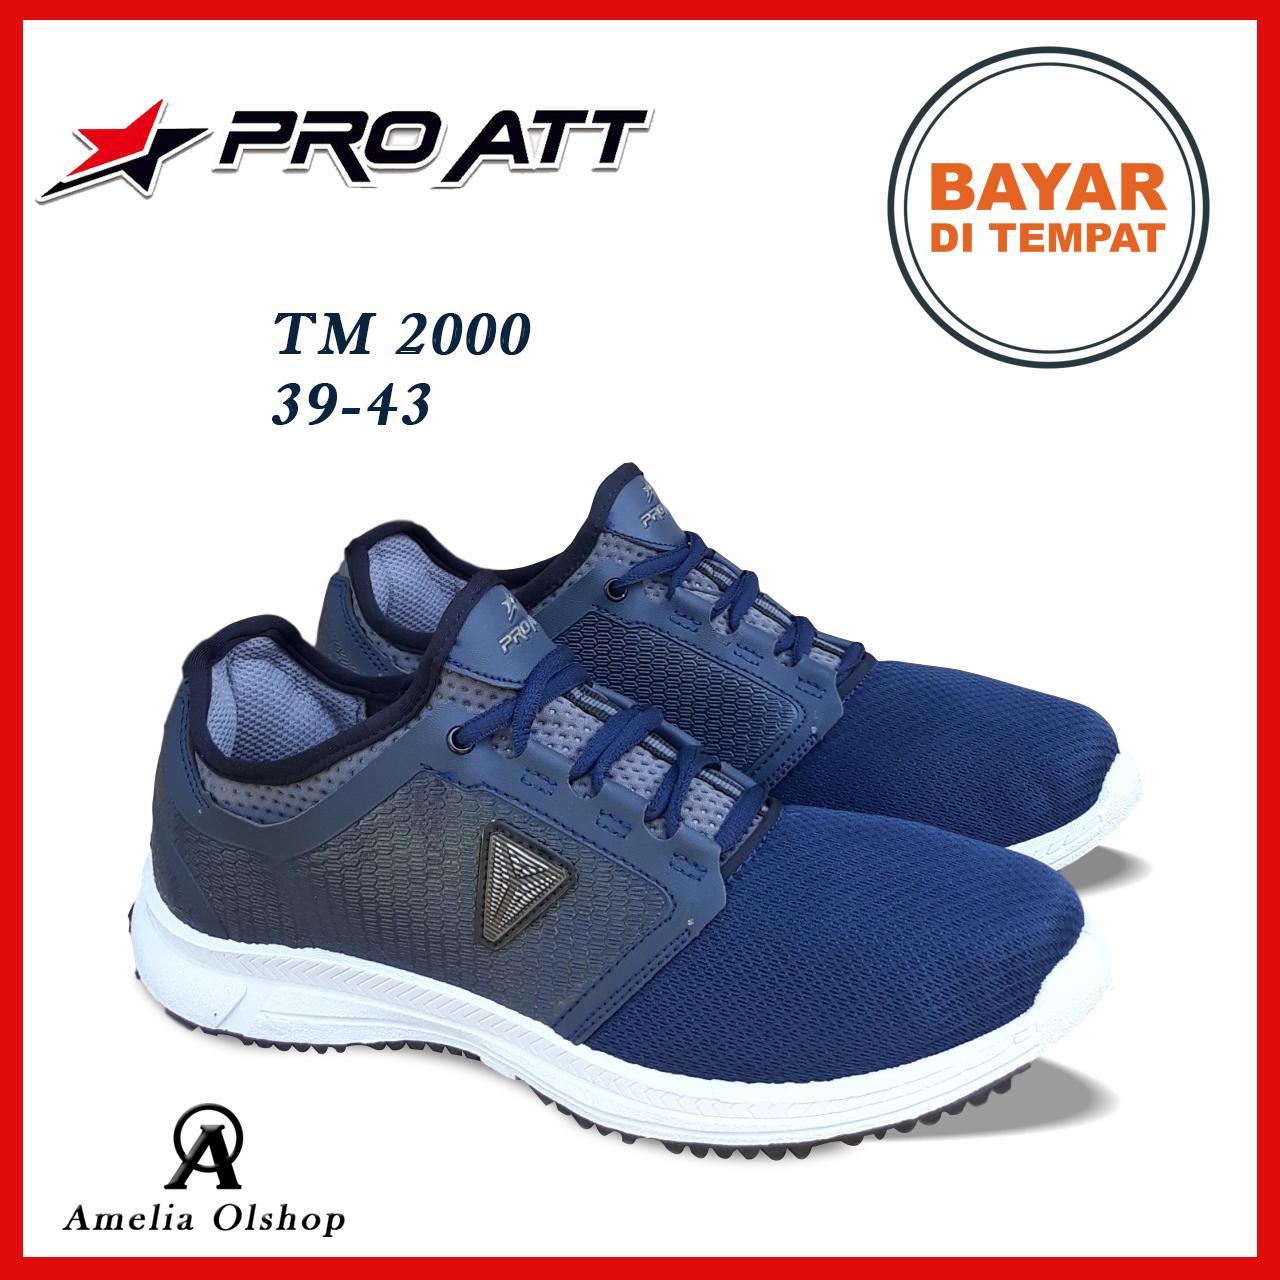 Amelia Olshop Sepatu Ardiles Bdg Nayron 39 43 Sepatu Pria Sepatu ... e242b1a637